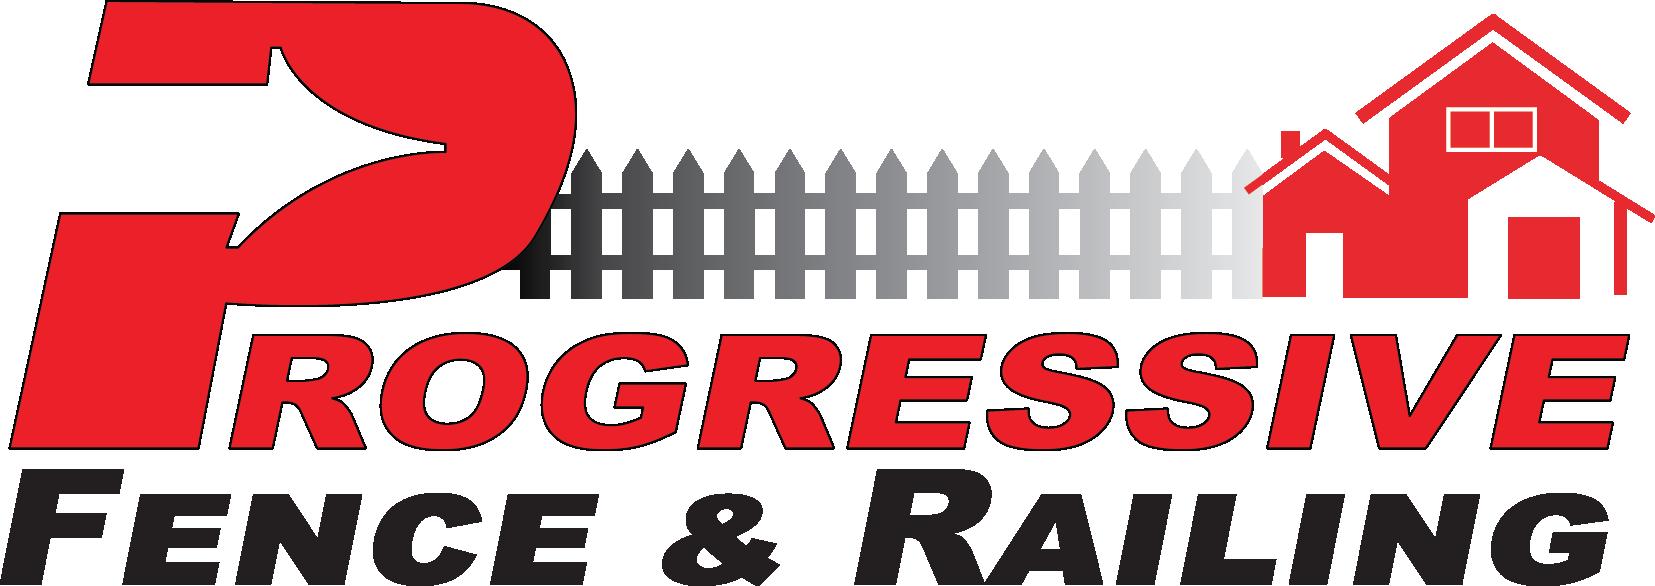 Progressive Fence and Railing